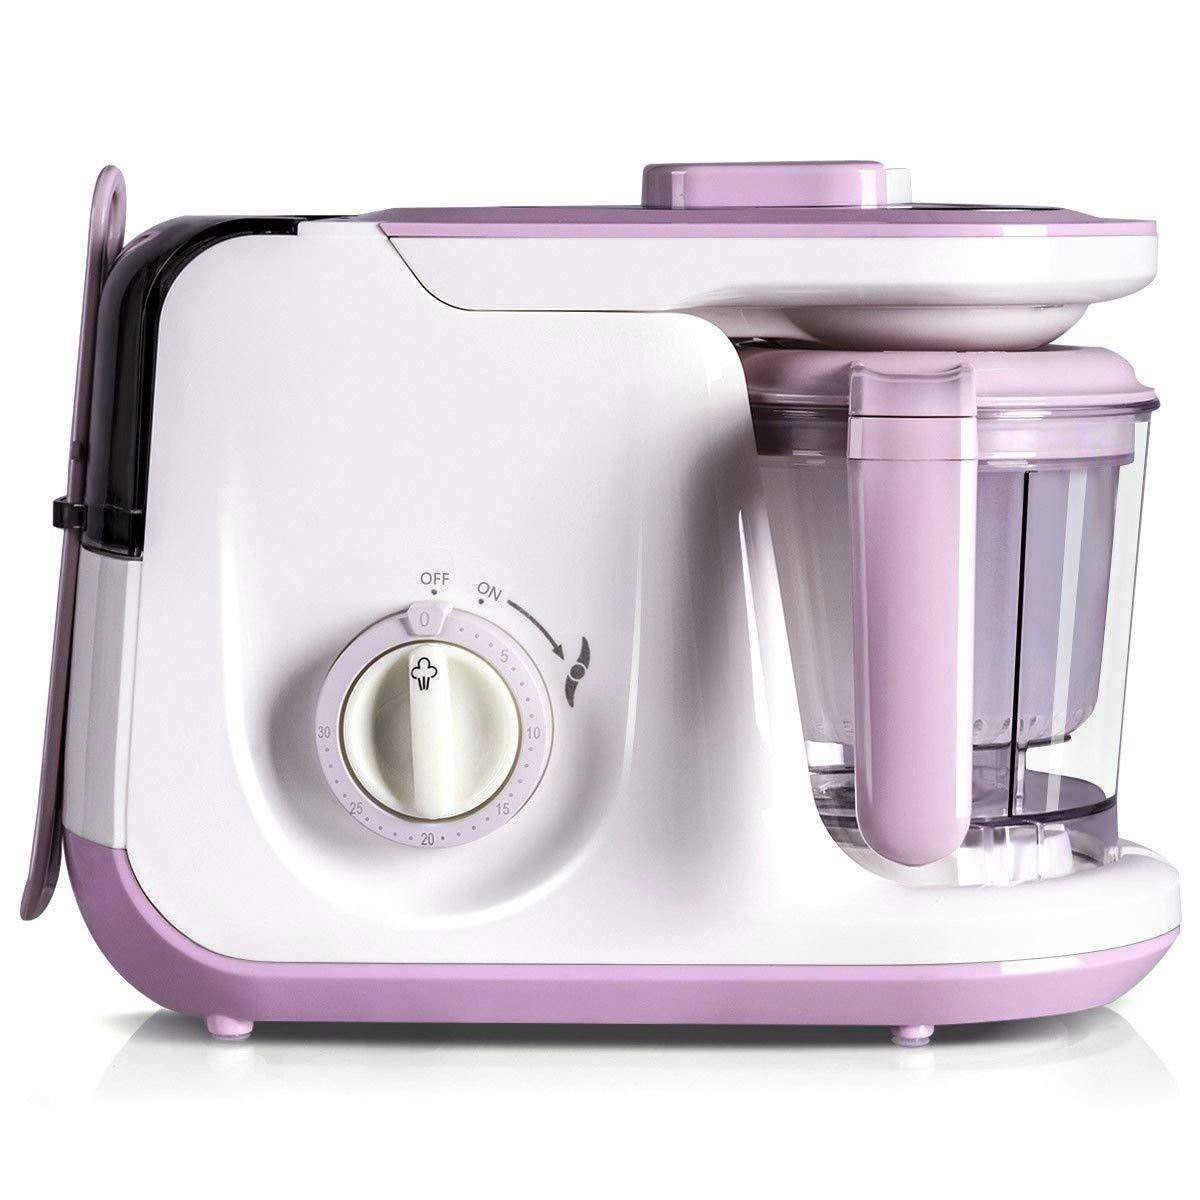 zwan 5 in 1 Heating Defrosting Baby Food Maker Infant Feeding Blender with Ebook